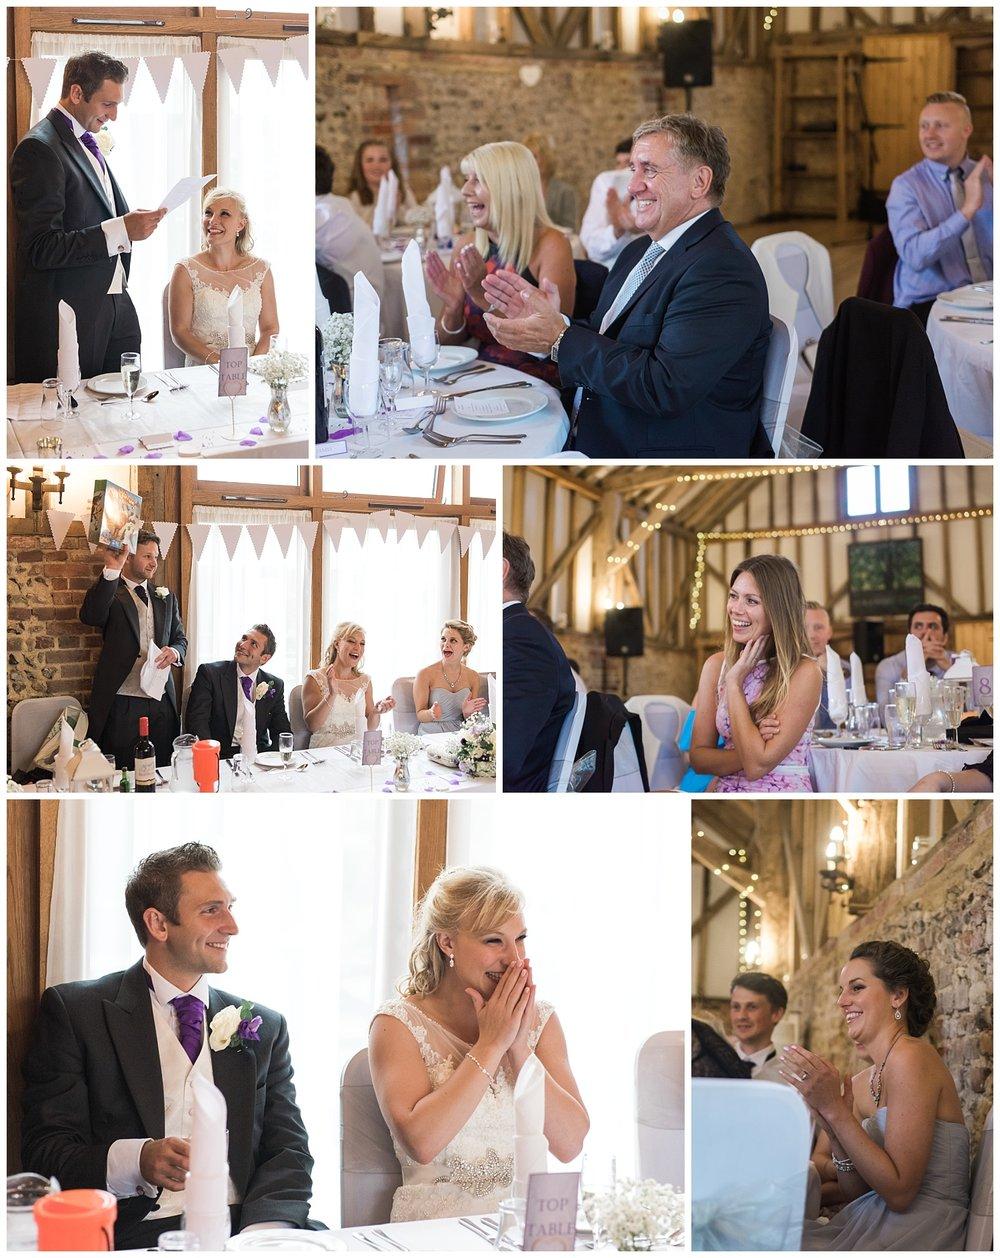 Charlotte and Jason Wedding - 10.09.2016-533.jpg